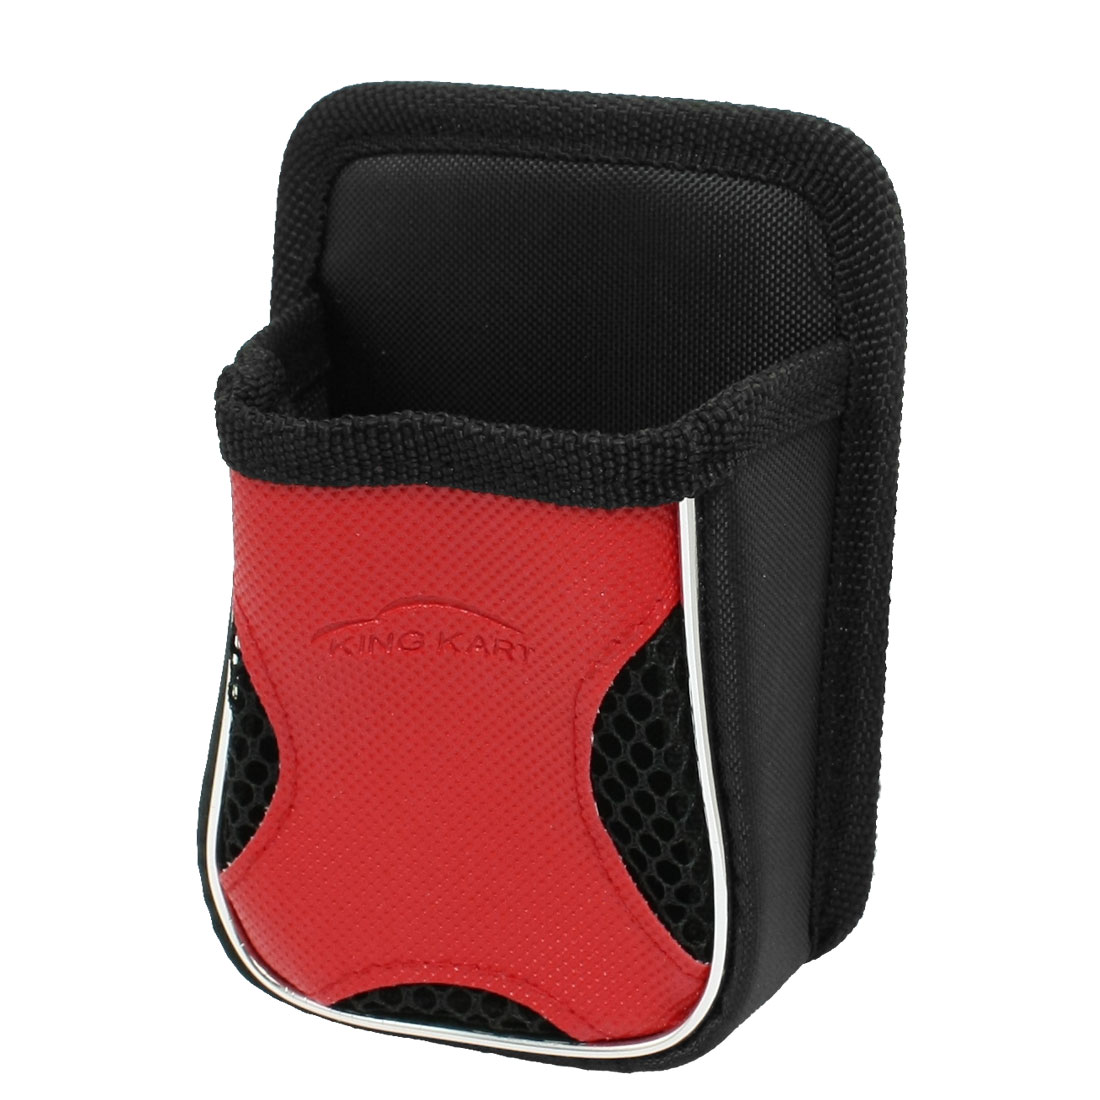 Black Red Mesh Pocket Car Air Vent Holder for Mobile Phone